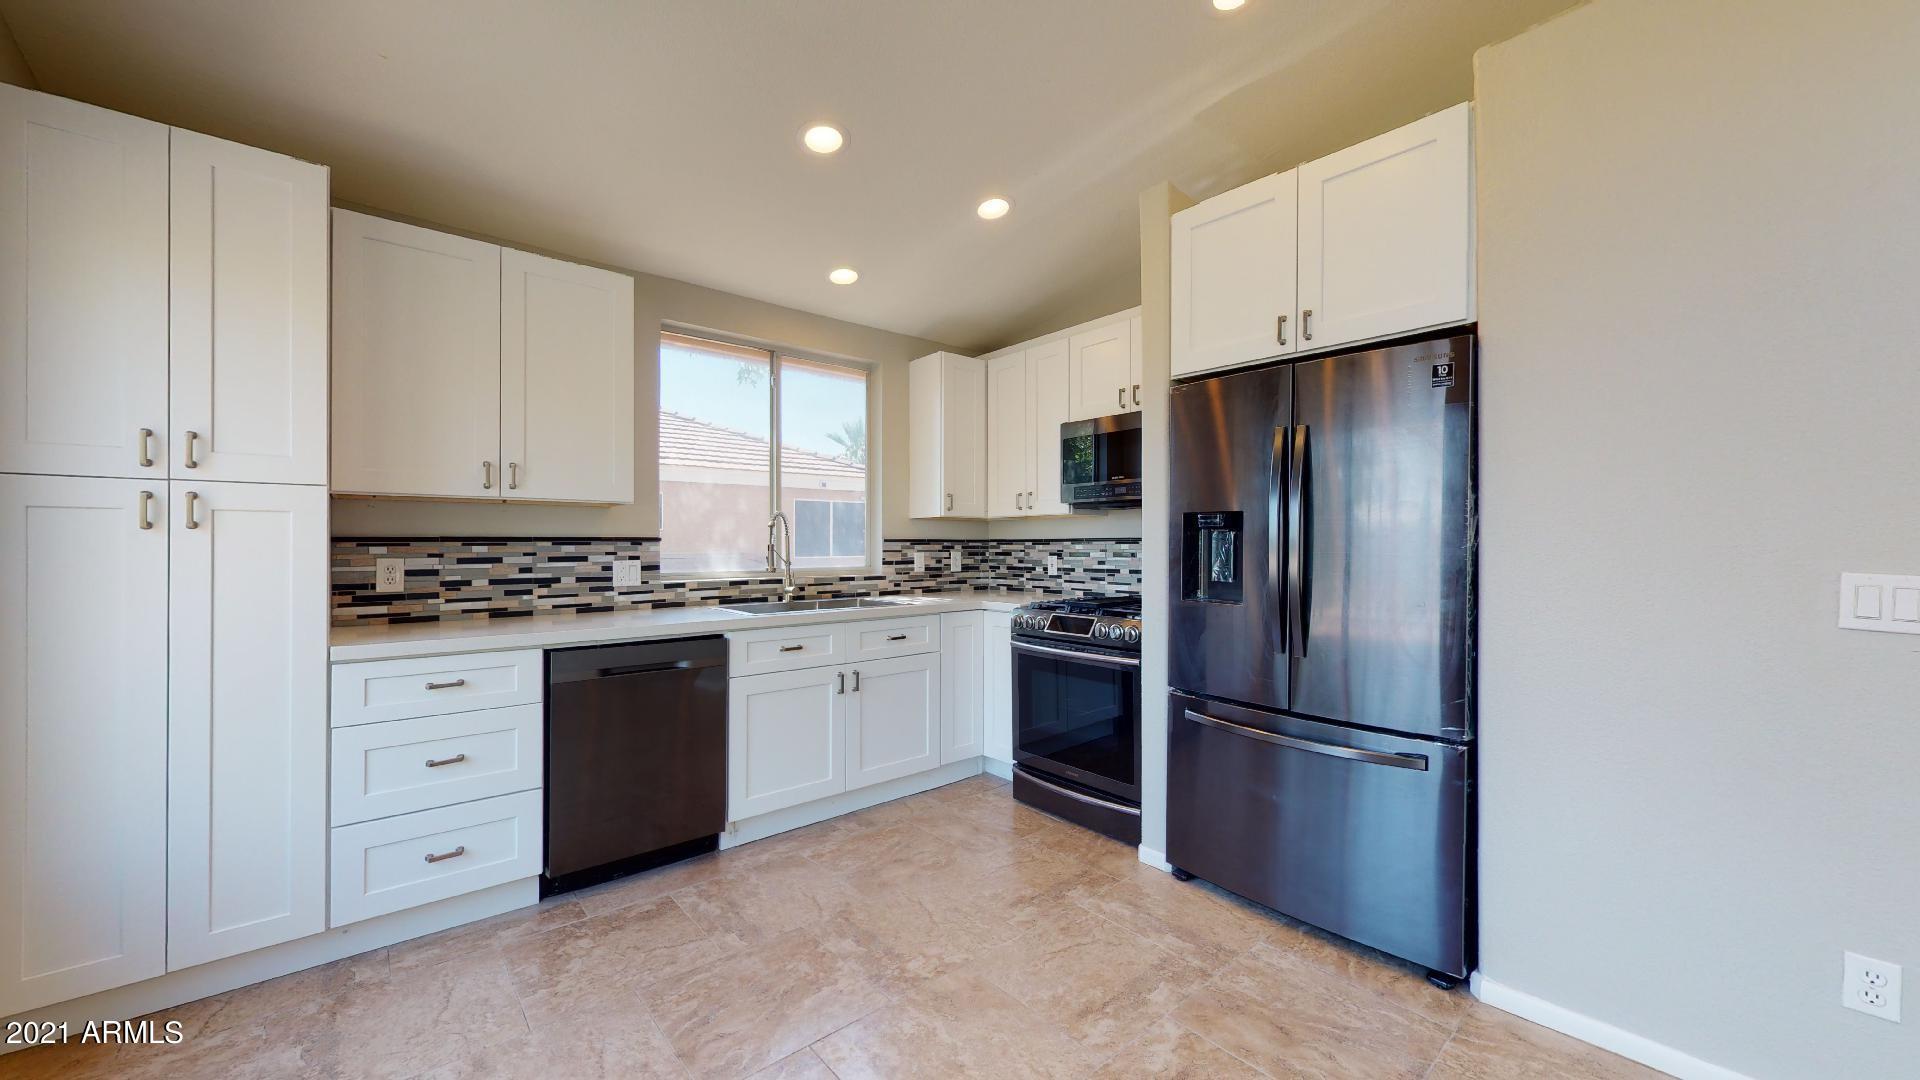 999 Leah Lane, Gilbert, Arizona 85233, 3 Bedrooms Bedrooms, ,2.5 BathroomsBathrooms,Residential,For Sale,Leah,6225620